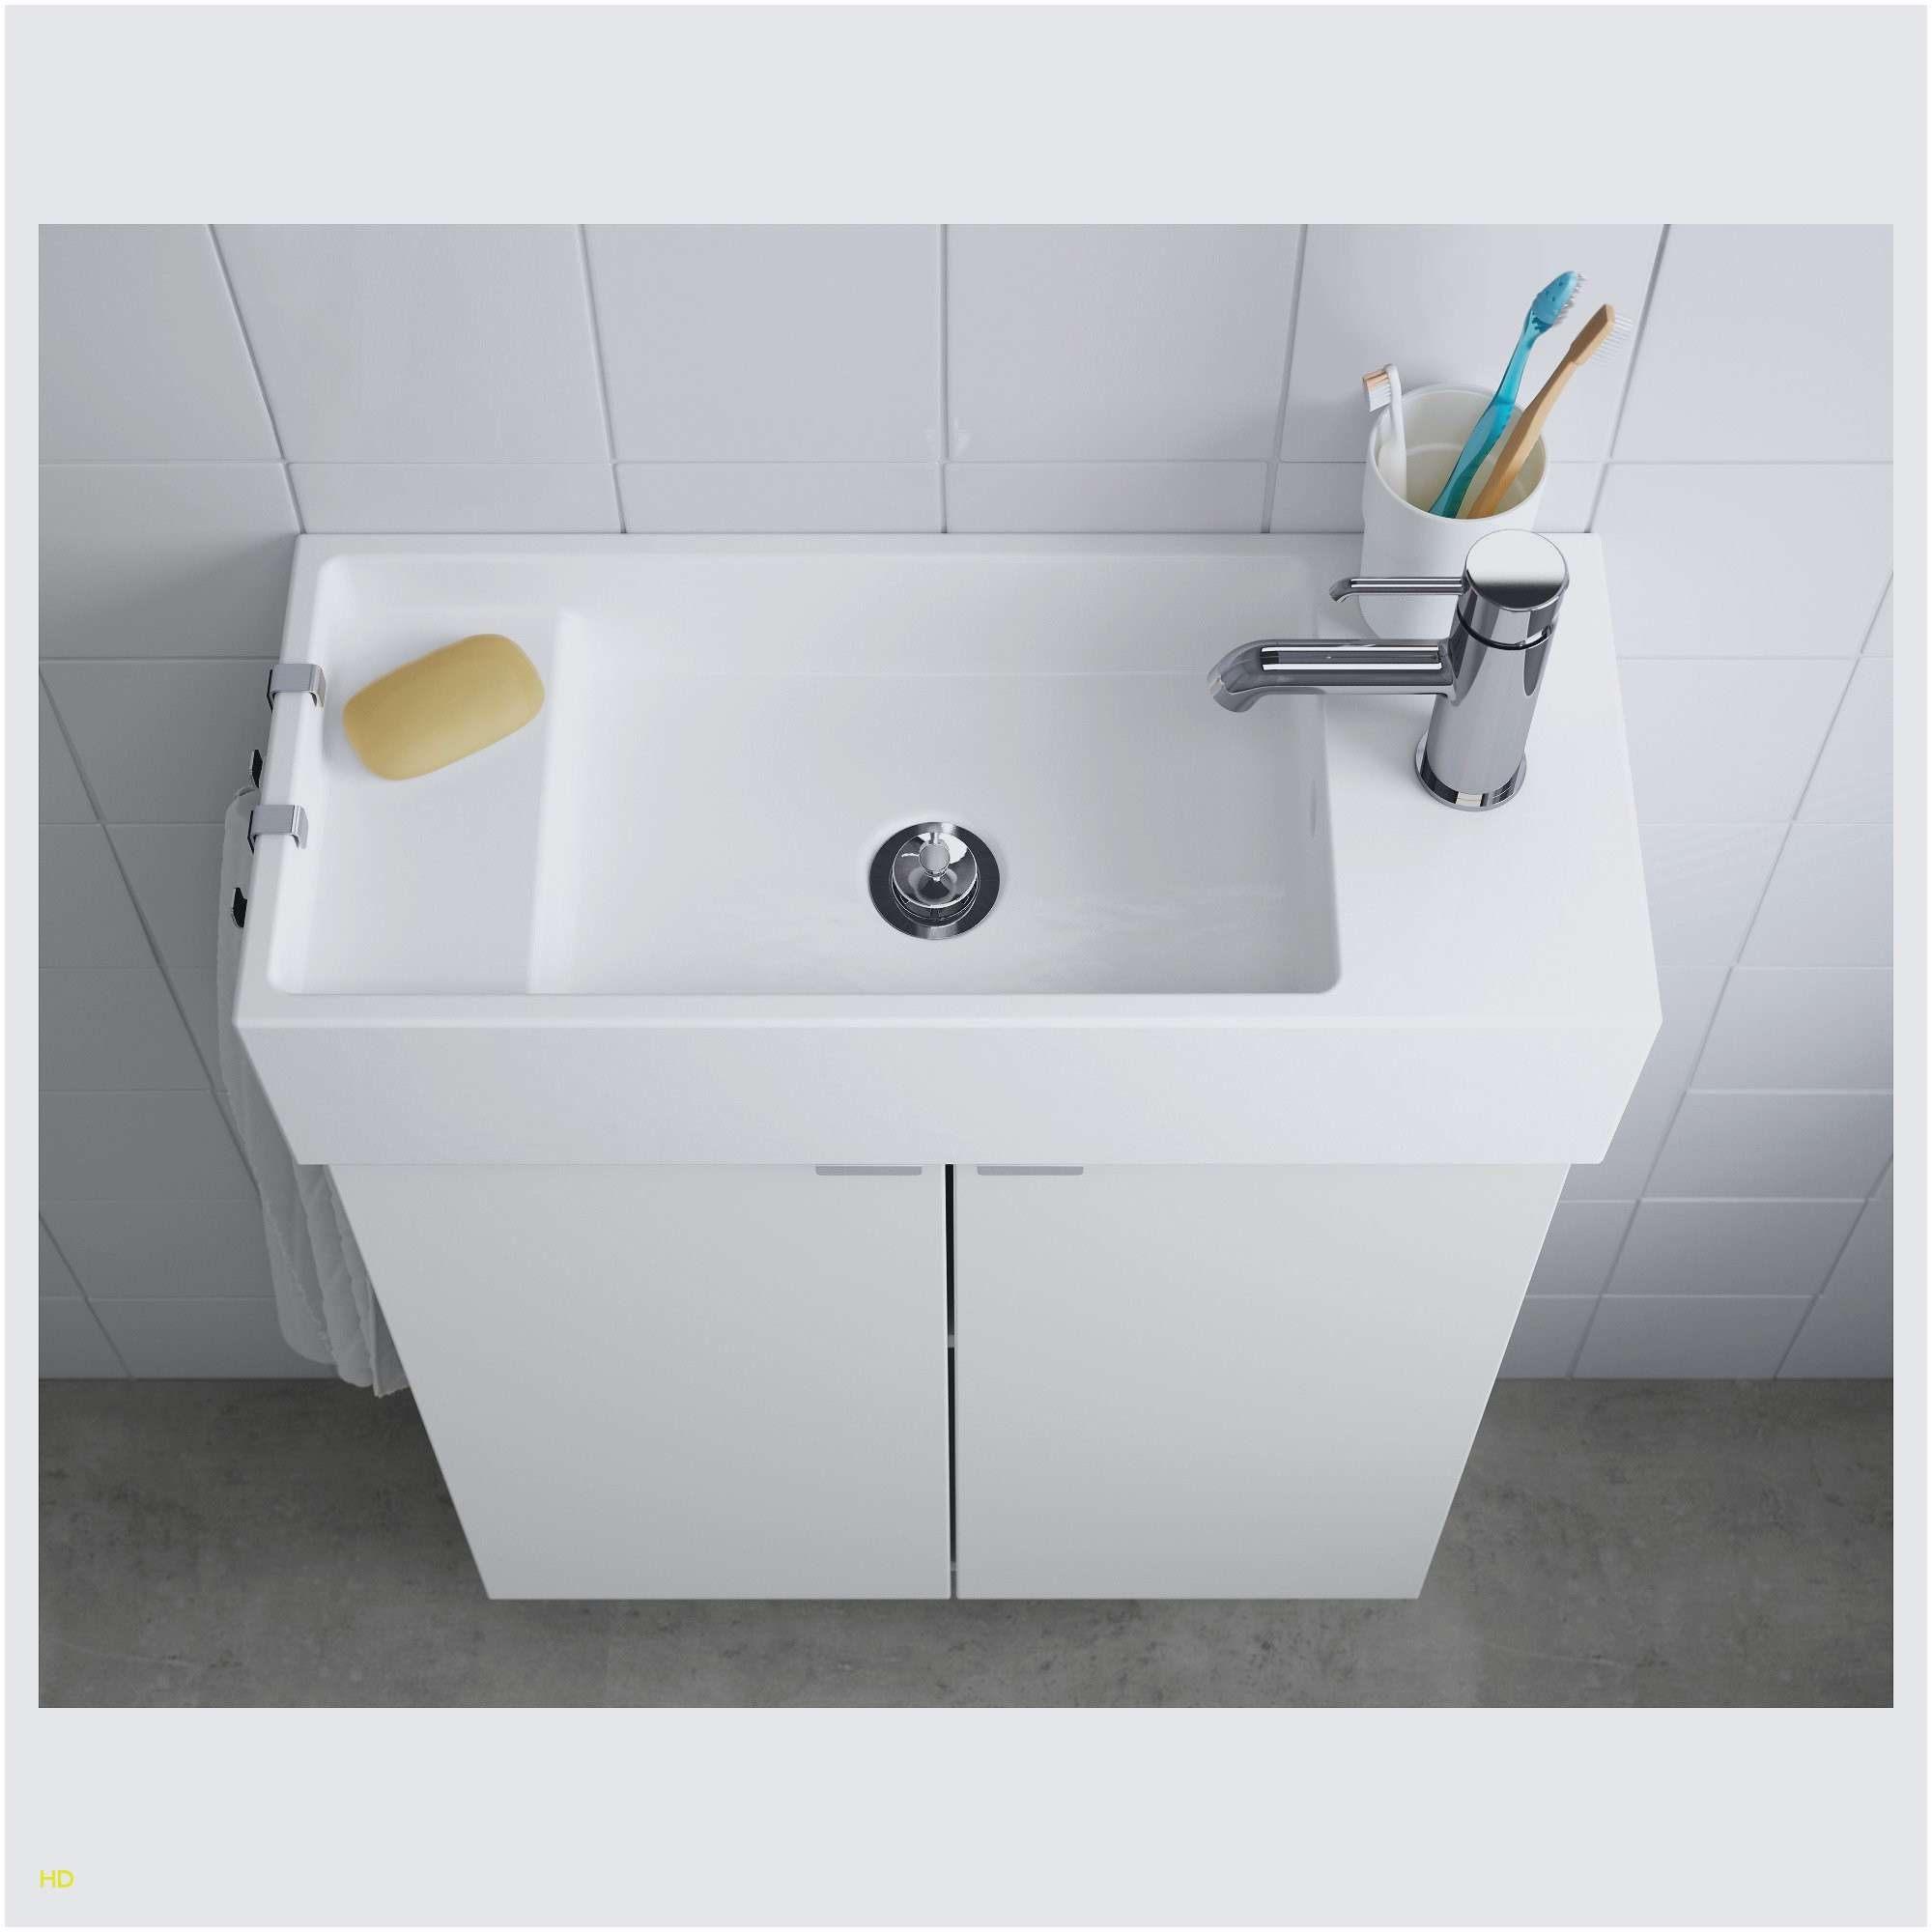 Lit Bureau Ikea Impressionnant Luxe Extraordinaire Bureau Angle Ikea but Trendy New Study Reveals